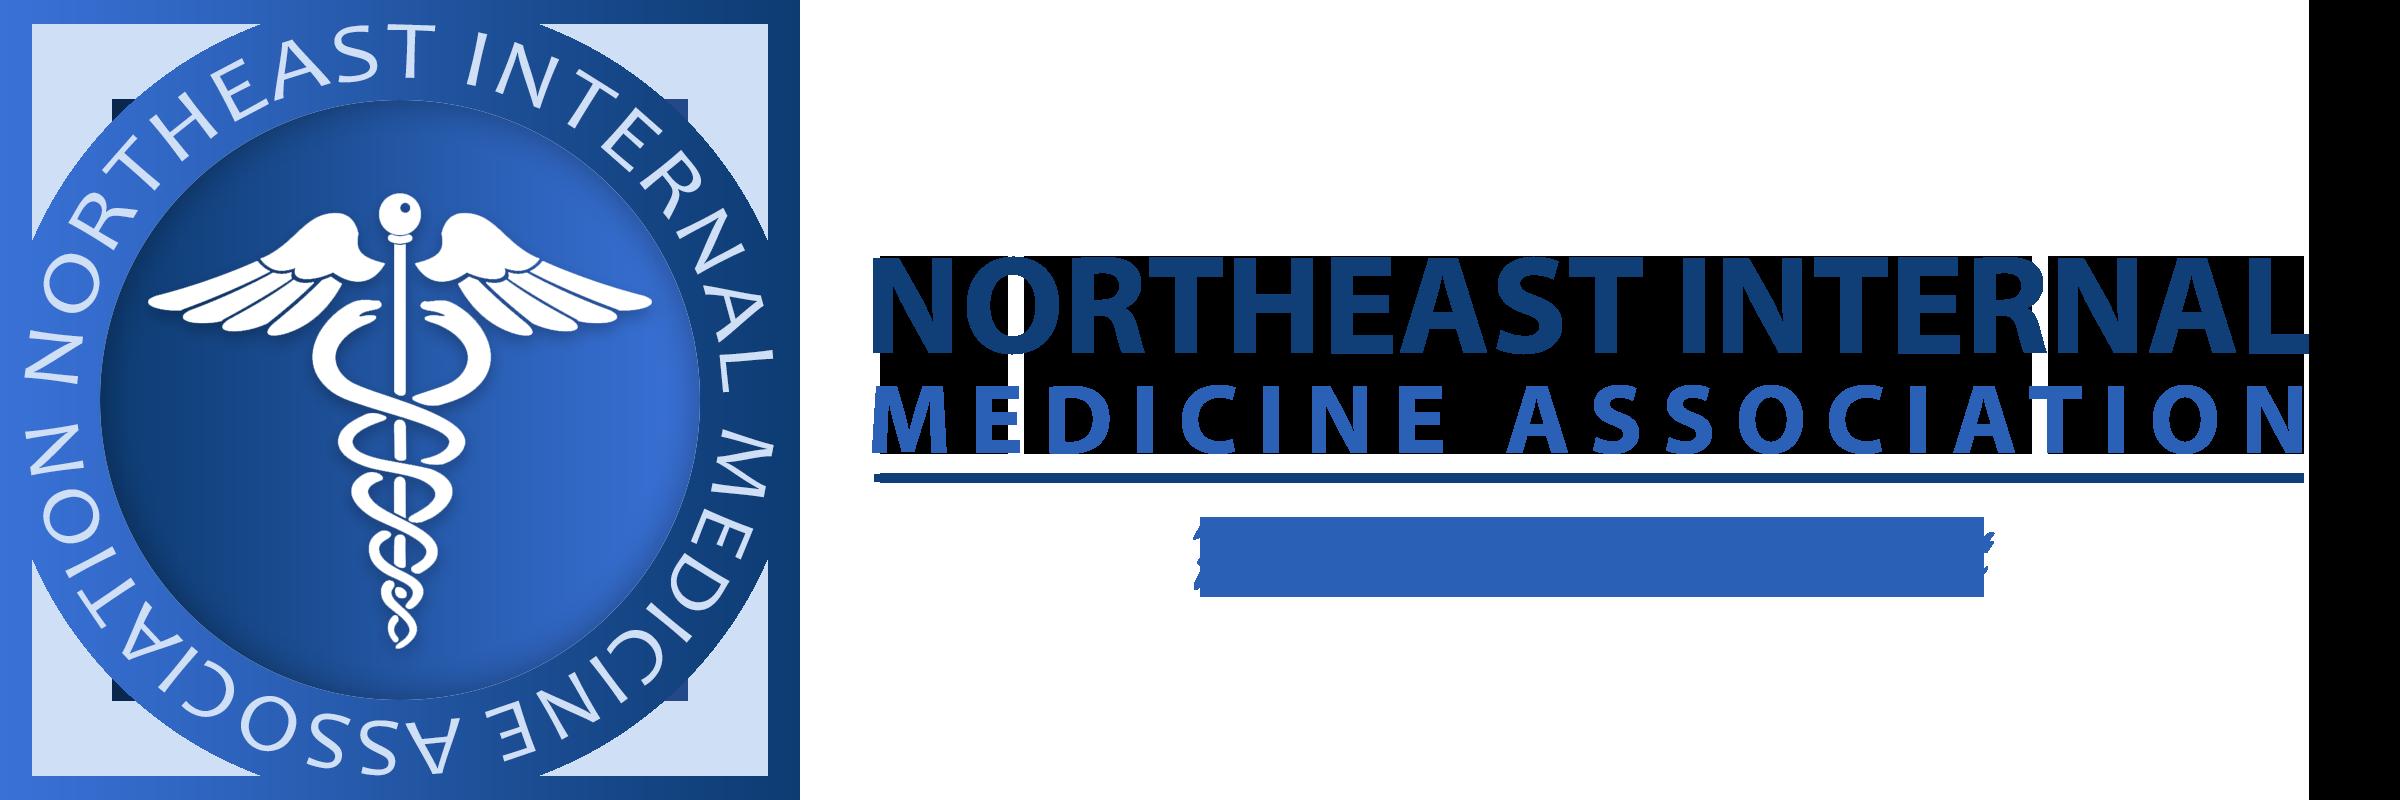 Northeast Internal Medicine